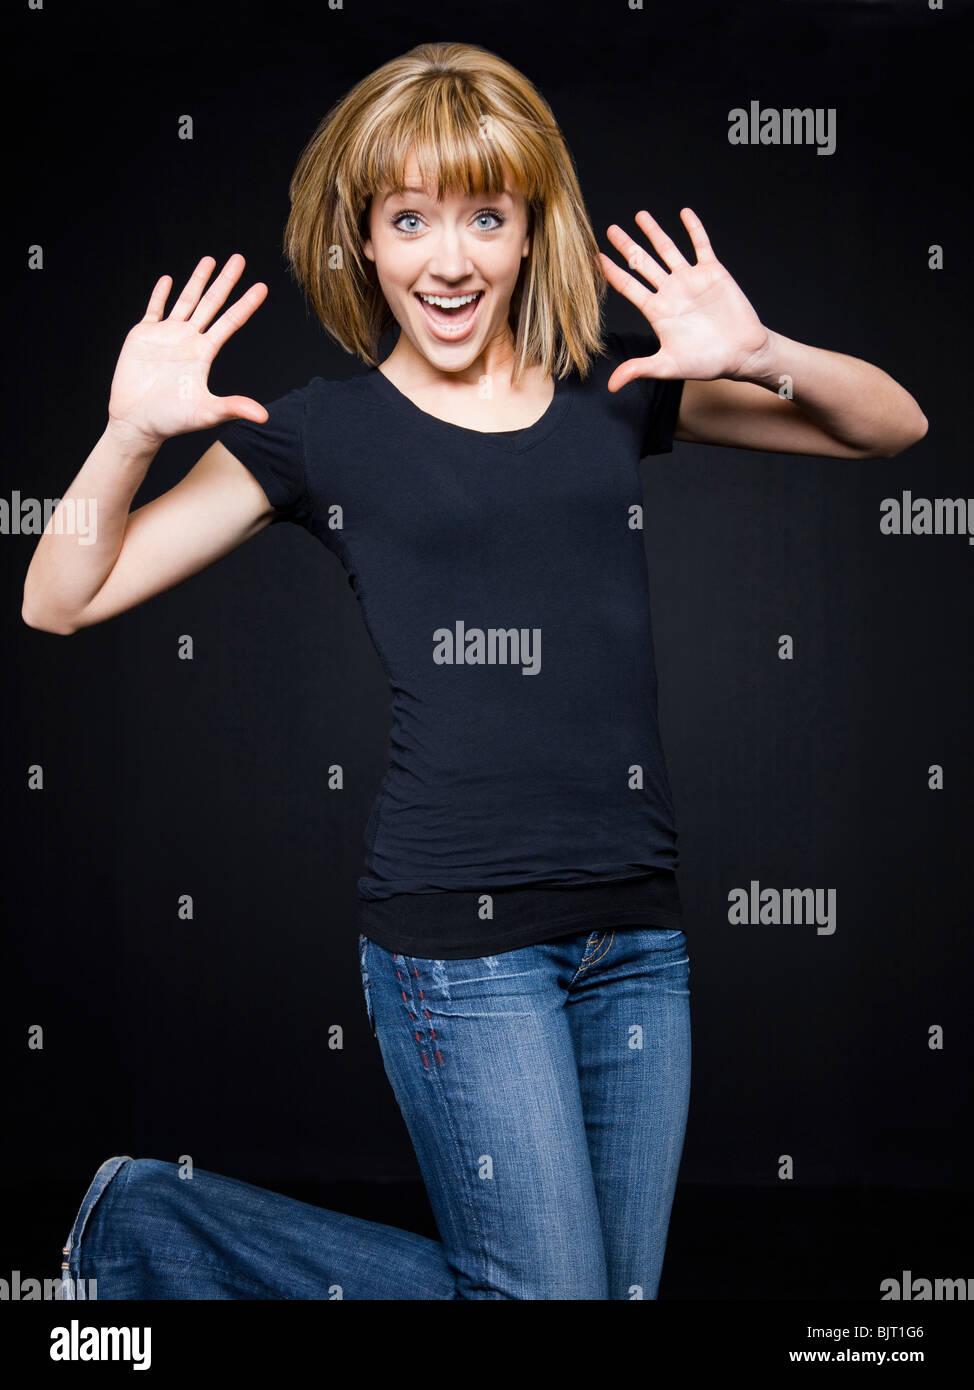 Young cheerful woman jumping, studio shot - Stock Image